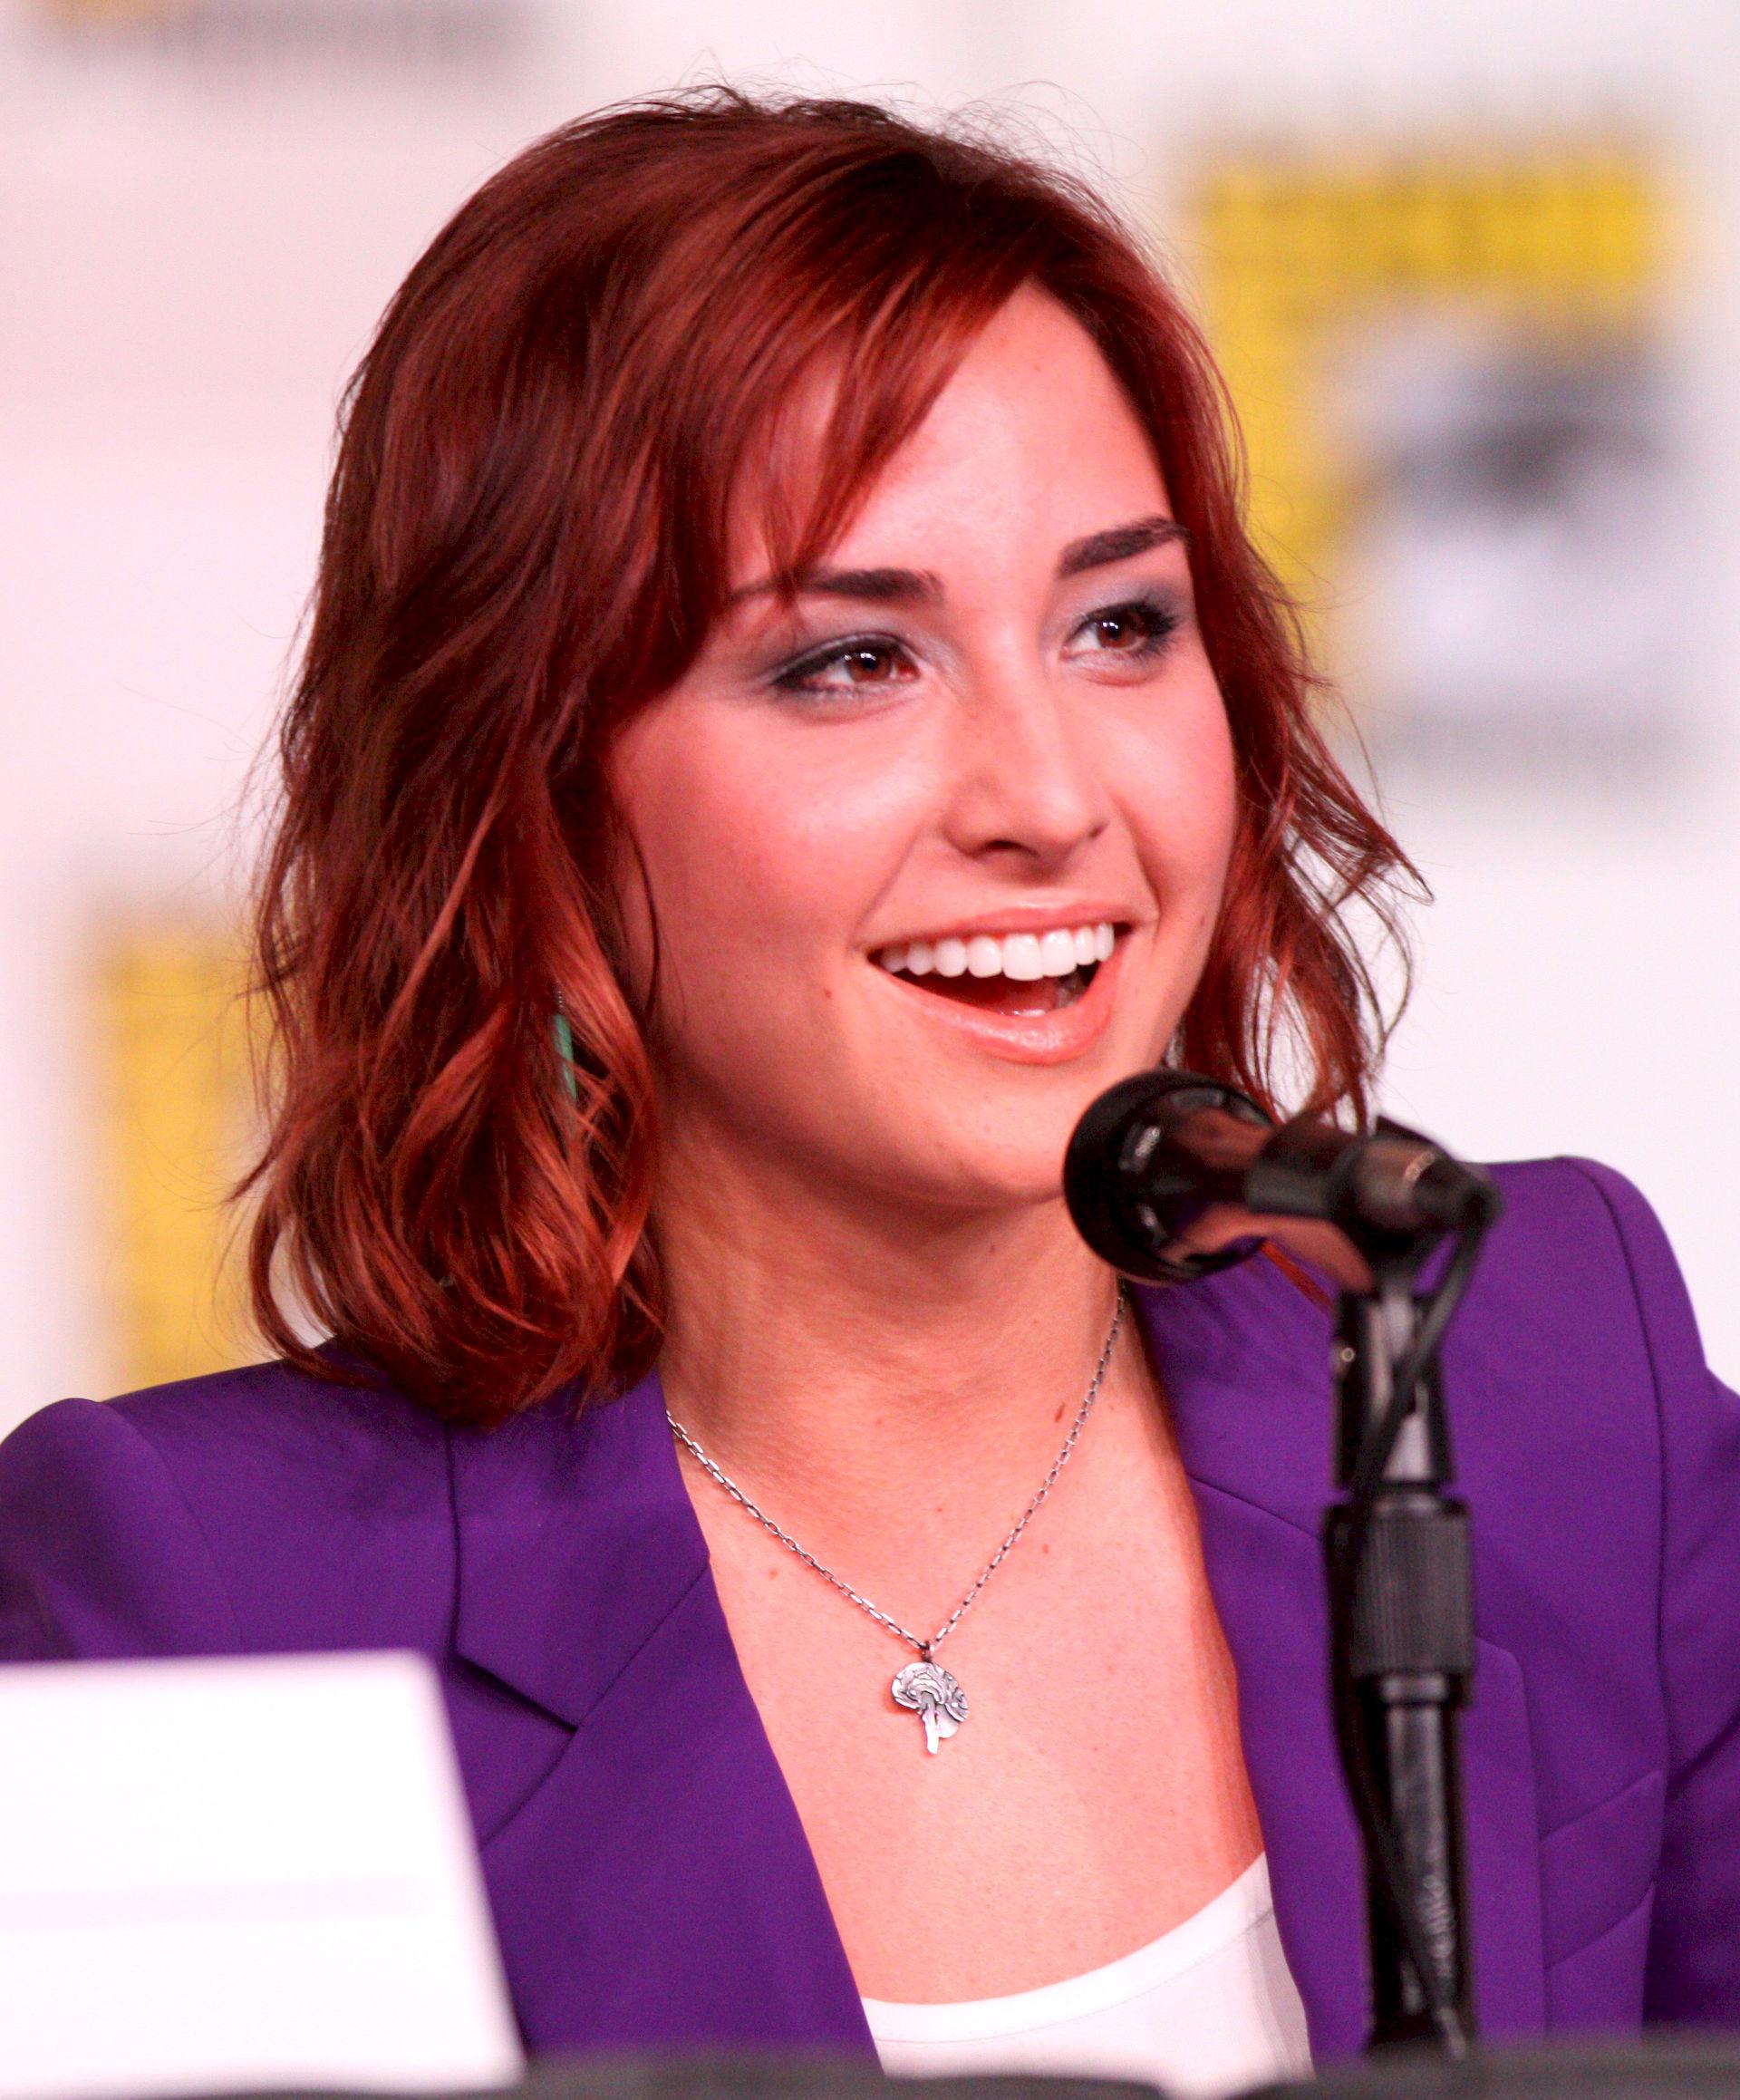 Photo of Allison Scagliotti: American actress